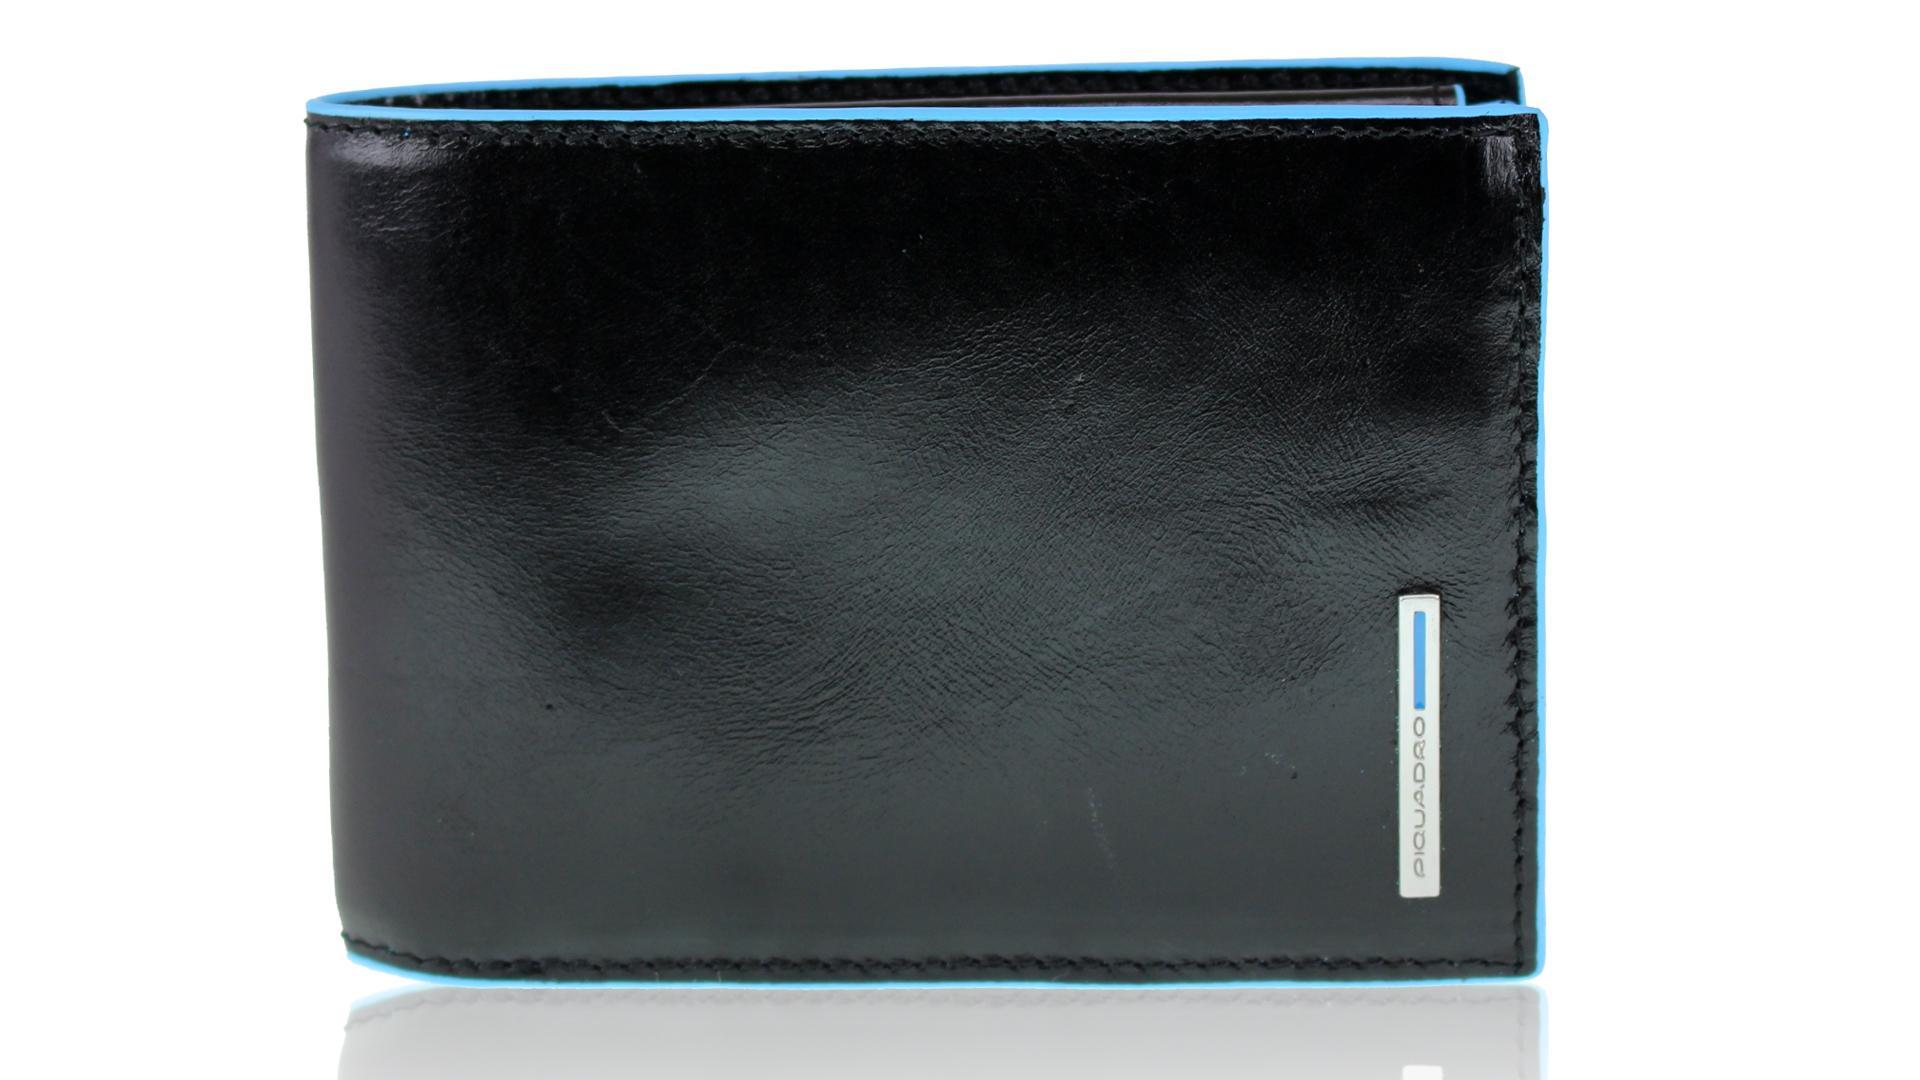 3eed31103a Portafogli uomo Piquadro Blue square PU1392B2 NERO